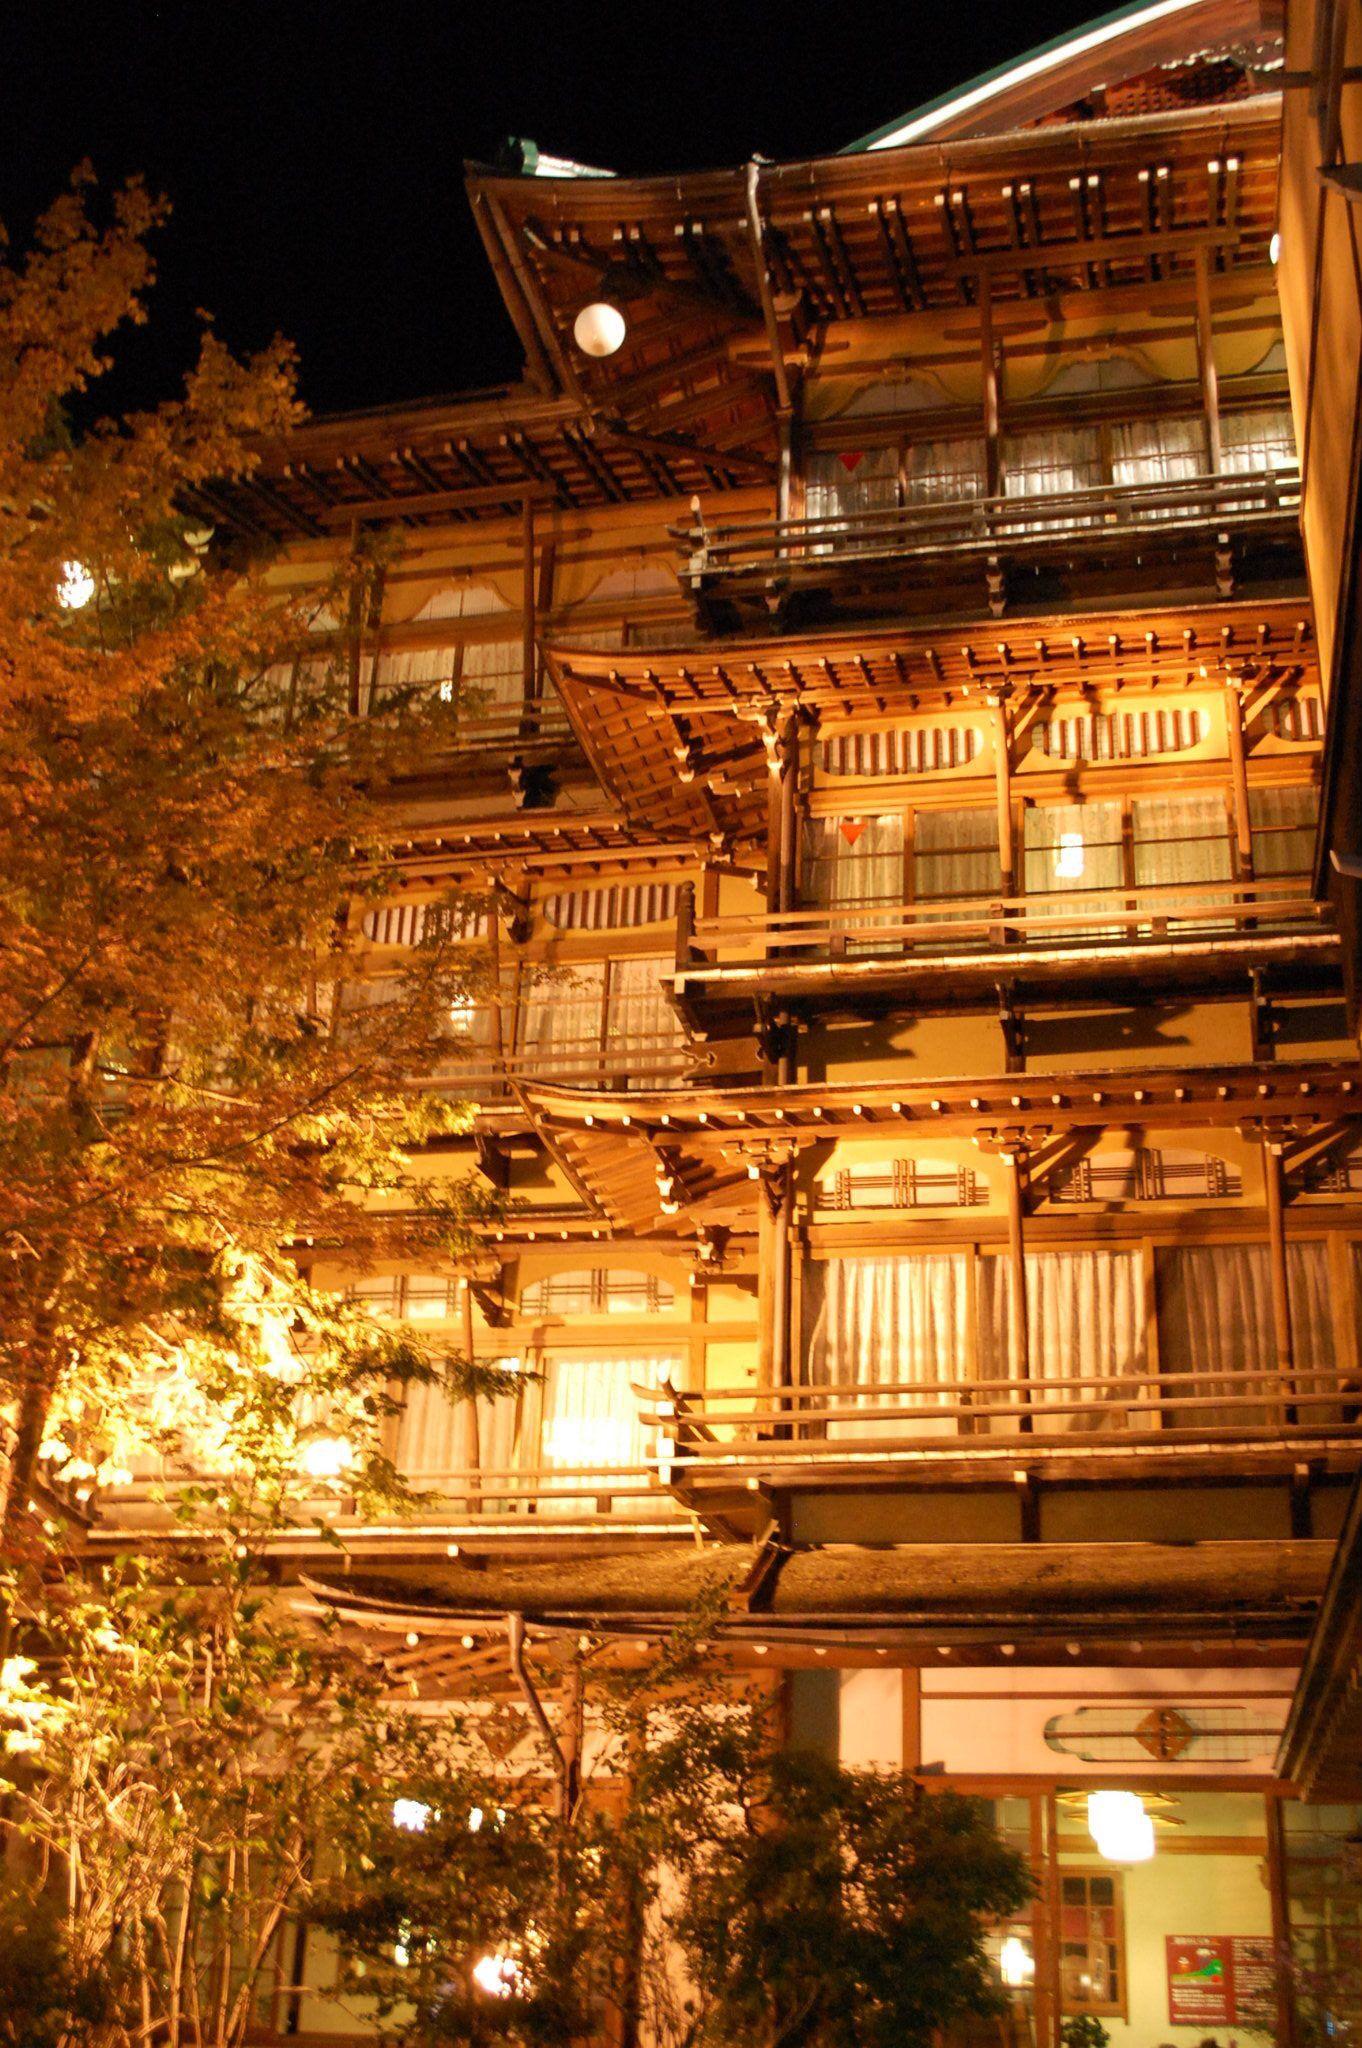 長野県 渋温泉 建築写真 温泉 美しい風景